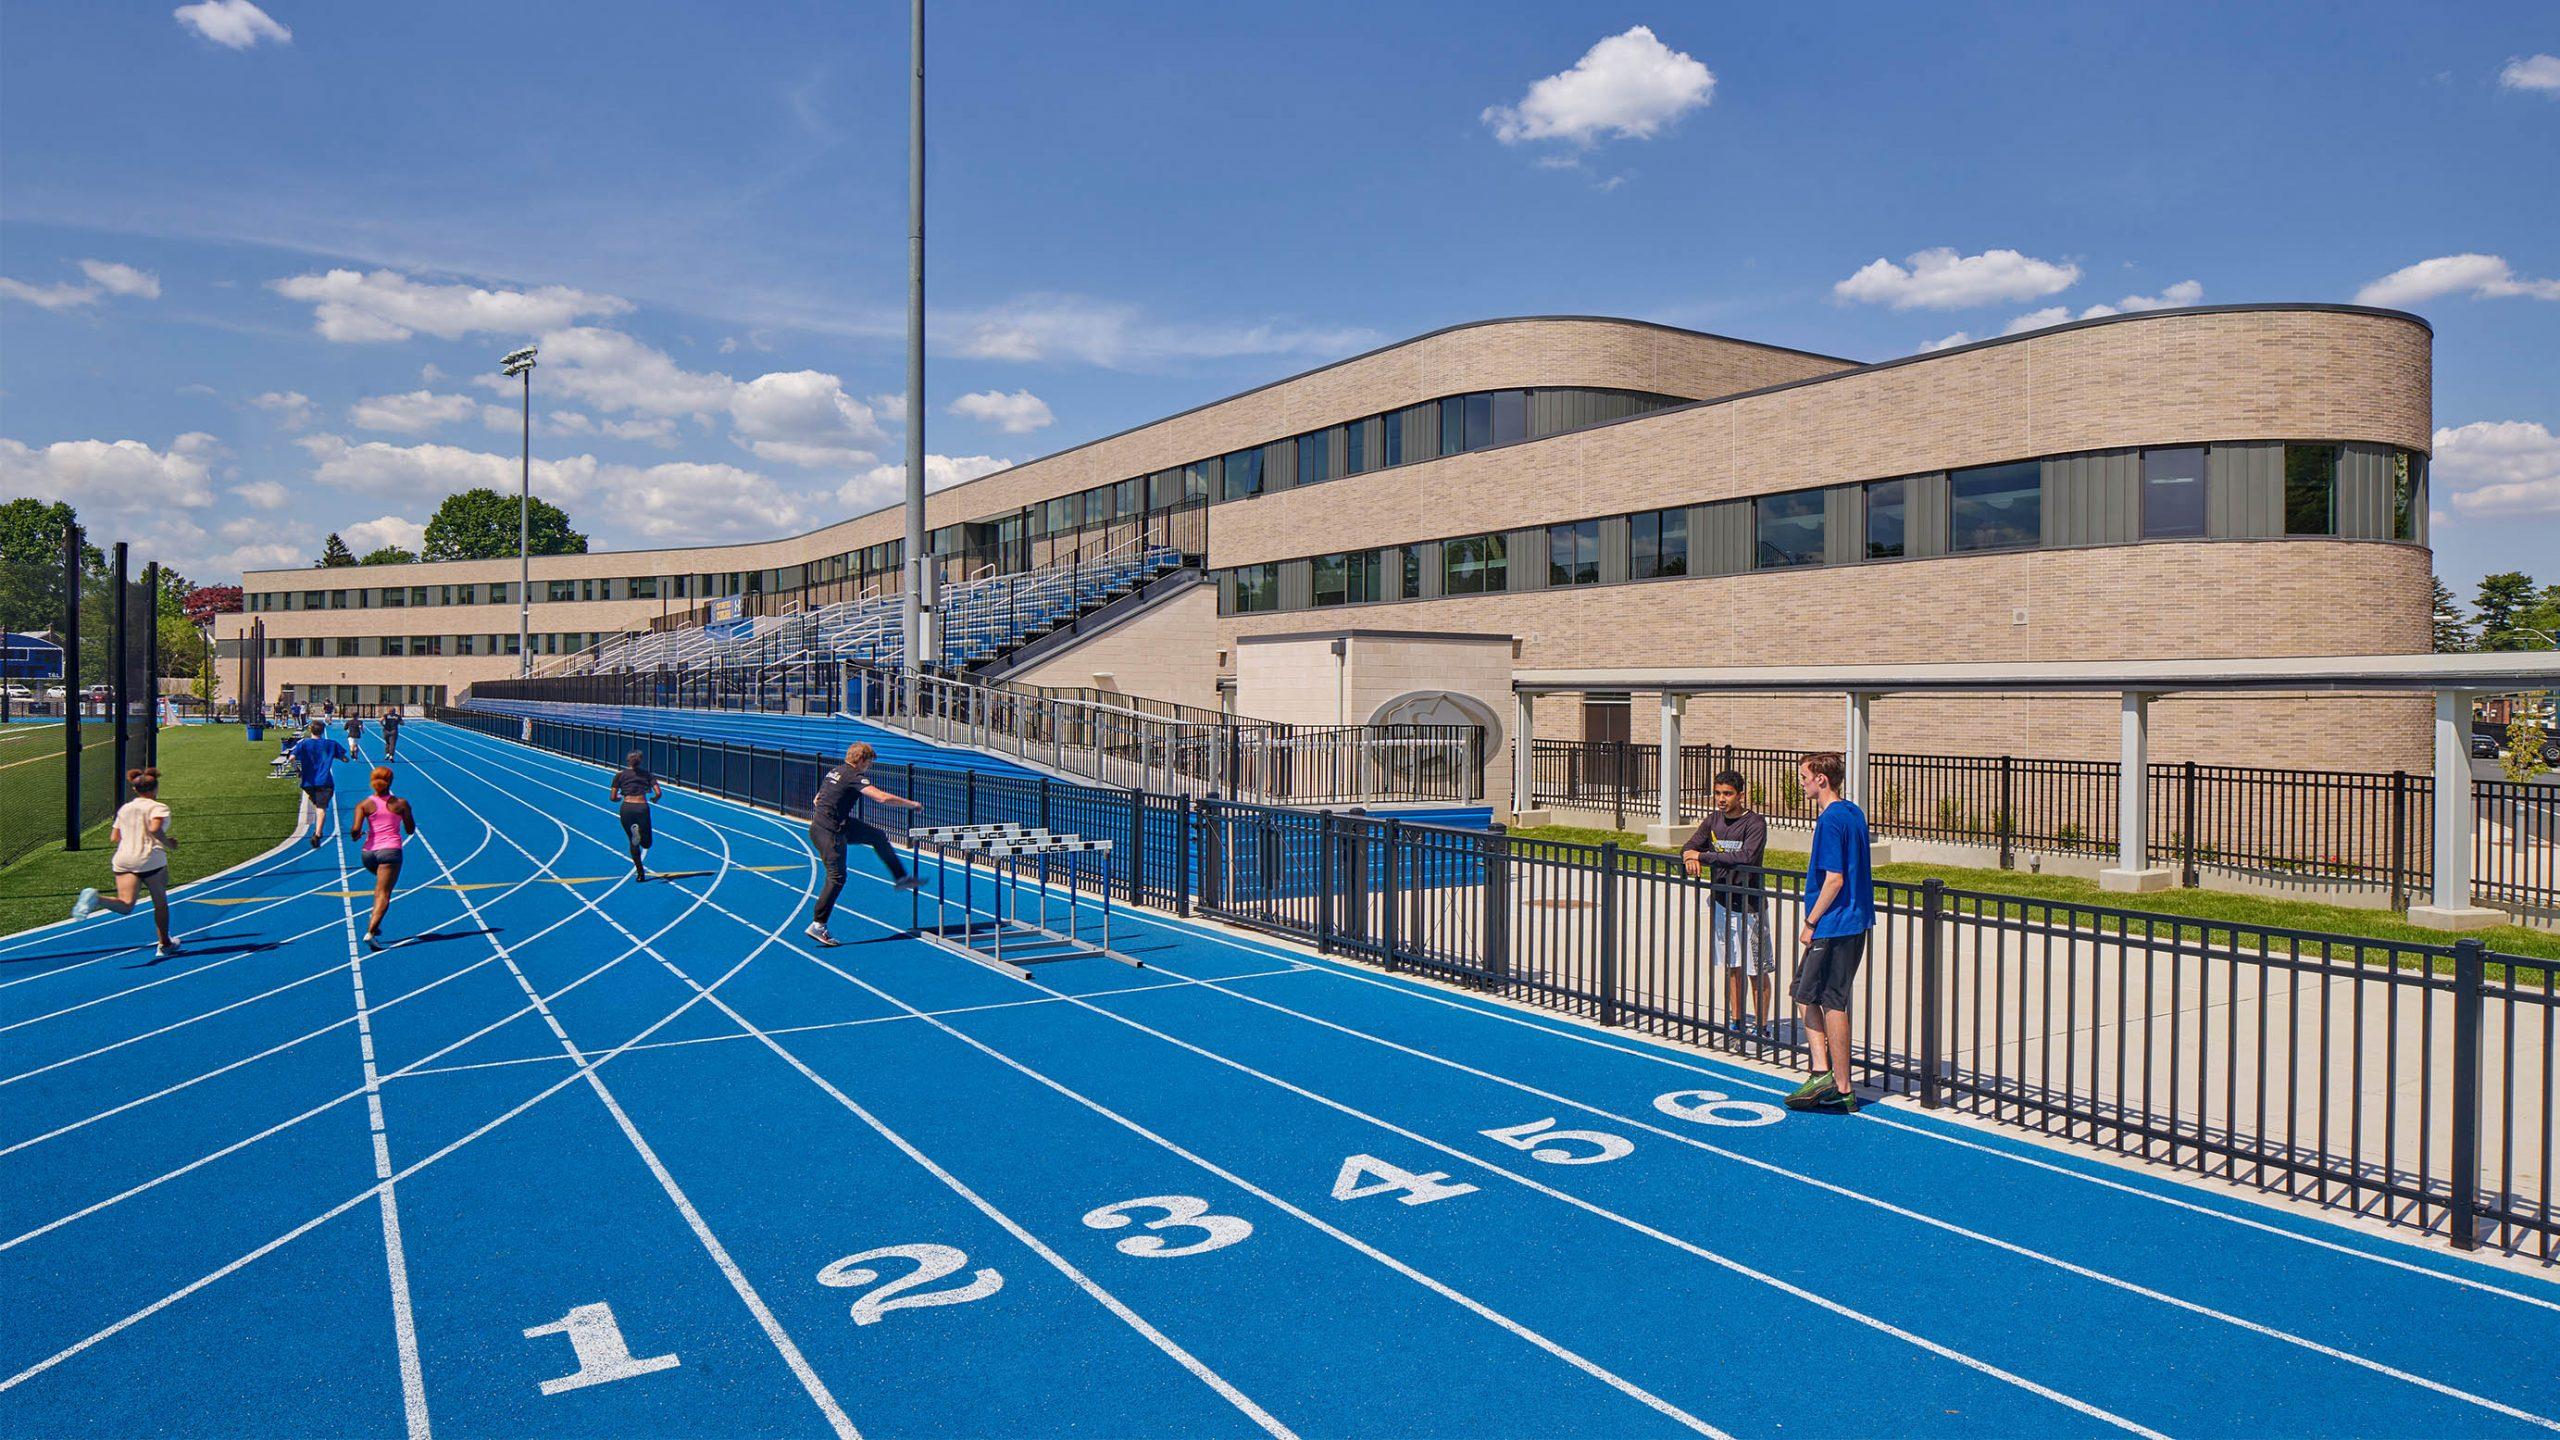 5-Athletics_SCHRADERGROUP_Springfield_School_District_High_School_Perkins&Will